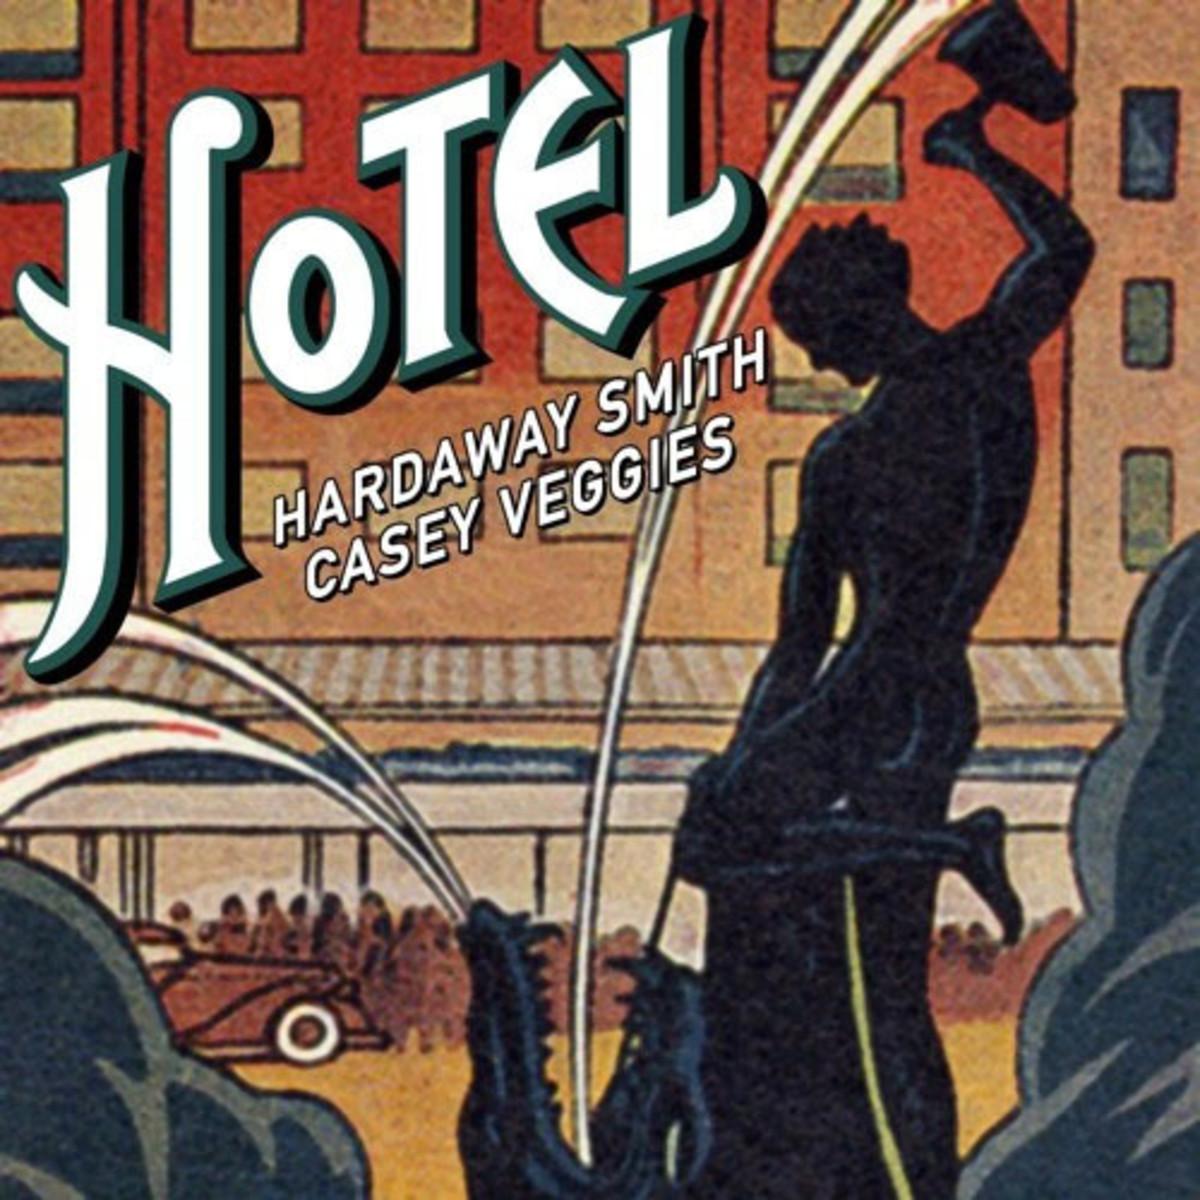 Hardaway-Smith-Hotel.jpg